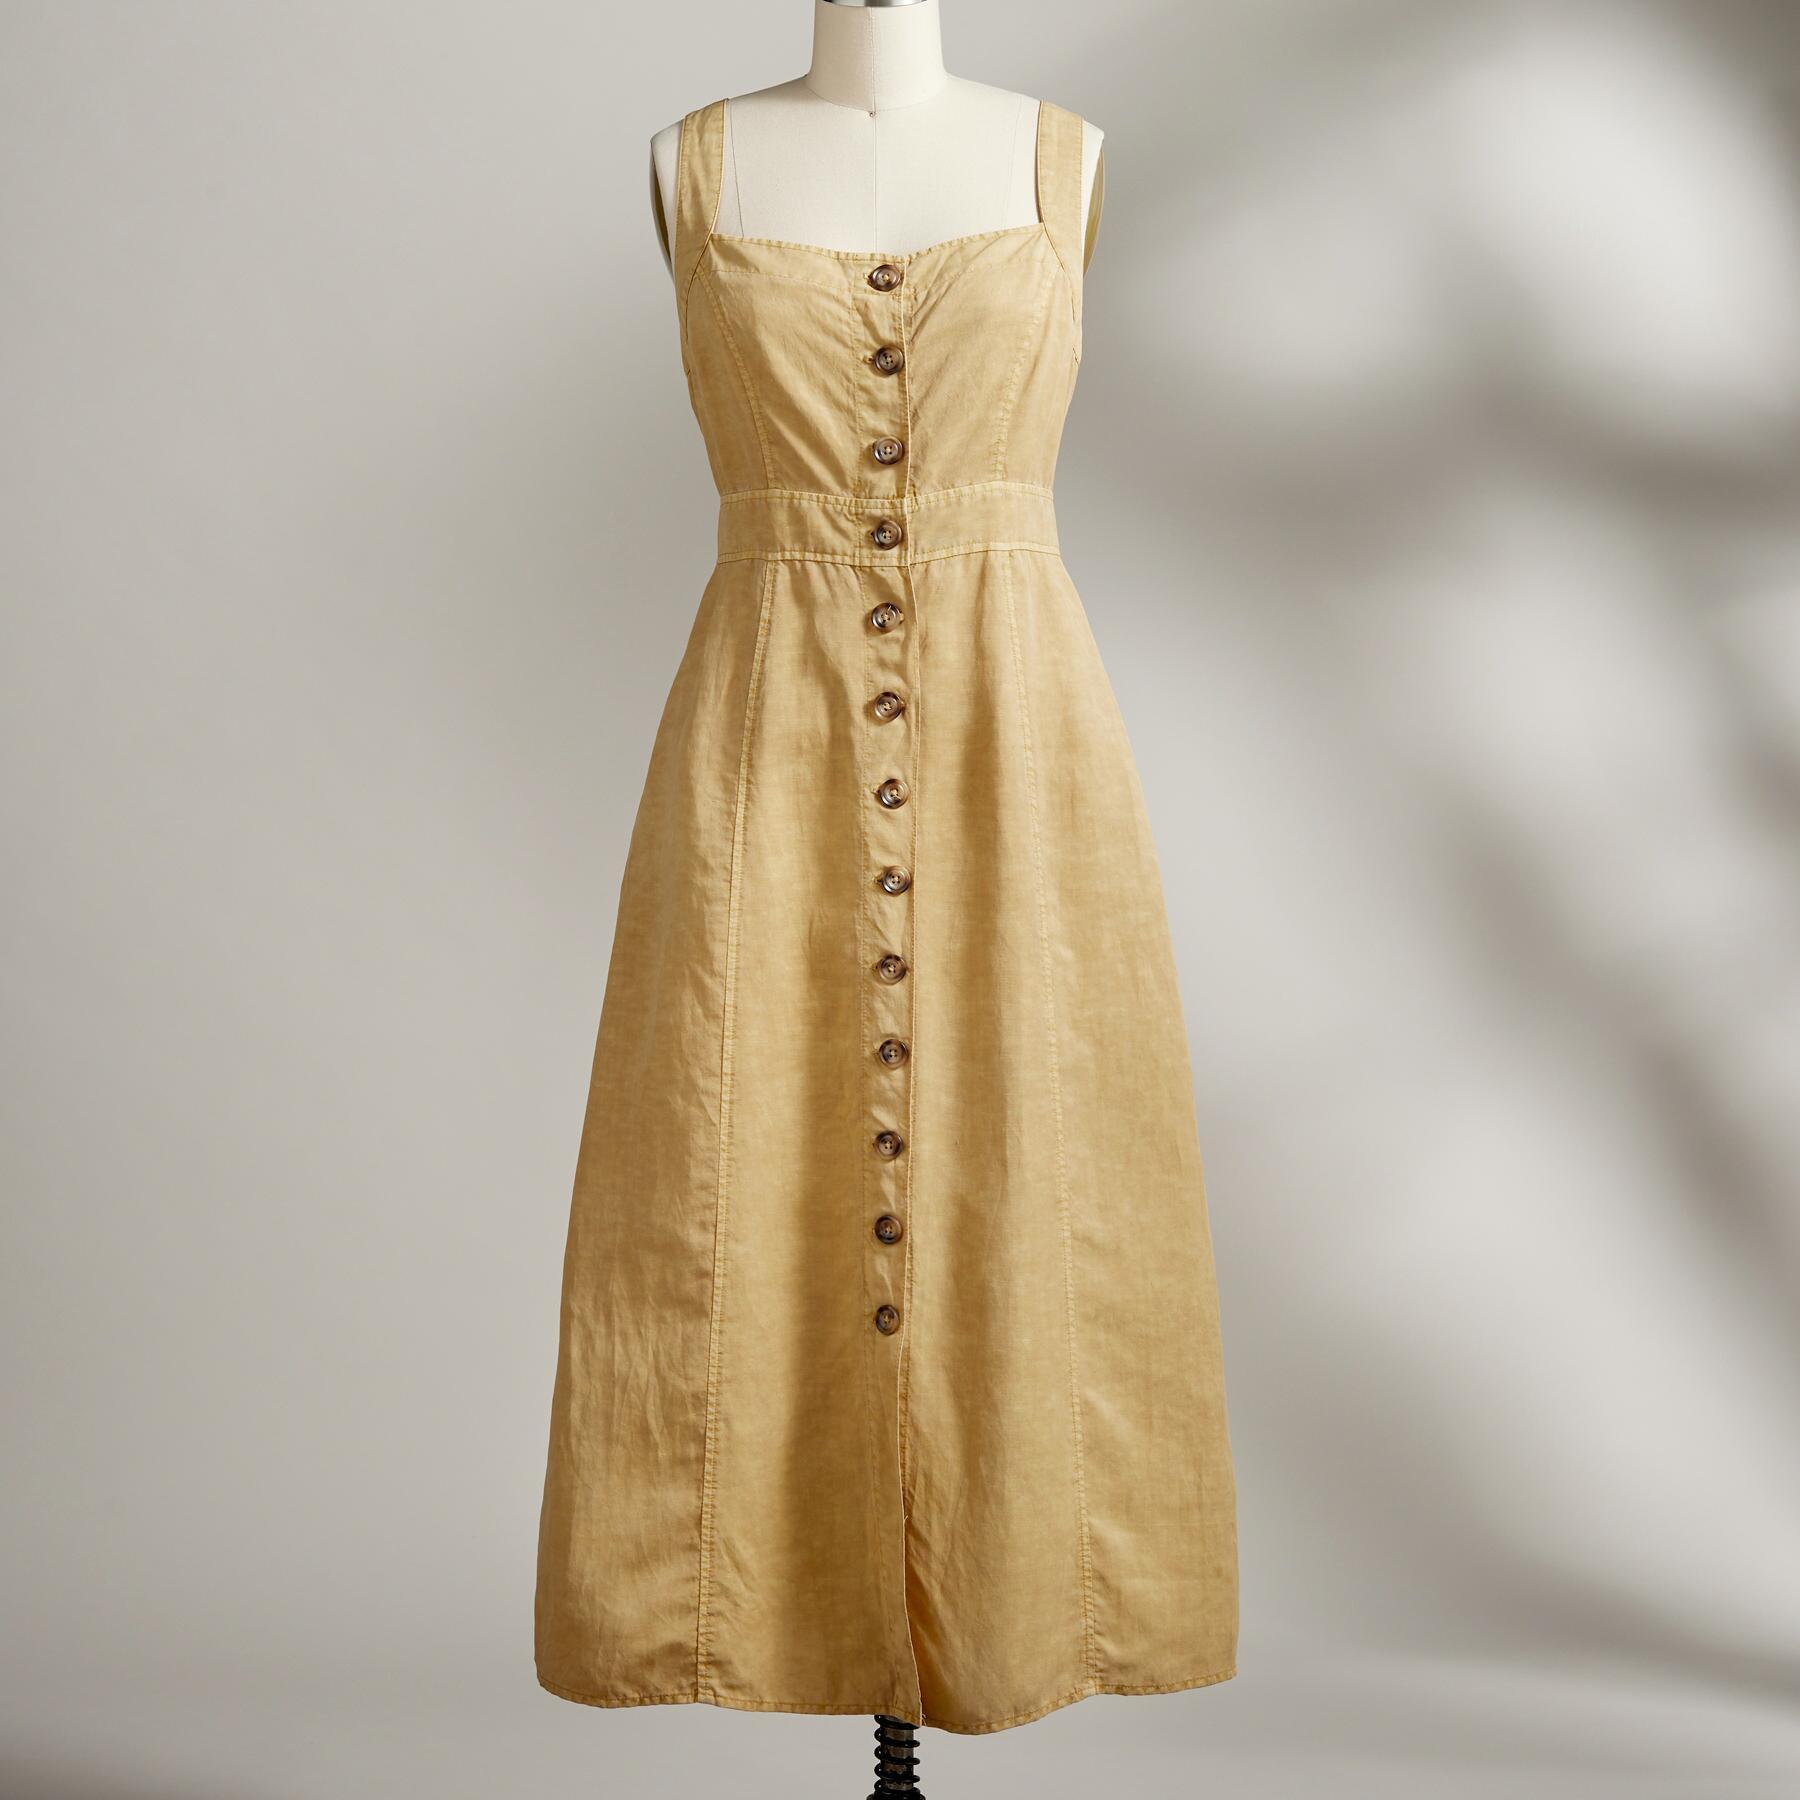 COLONIAL DRESS PETITE: View 2